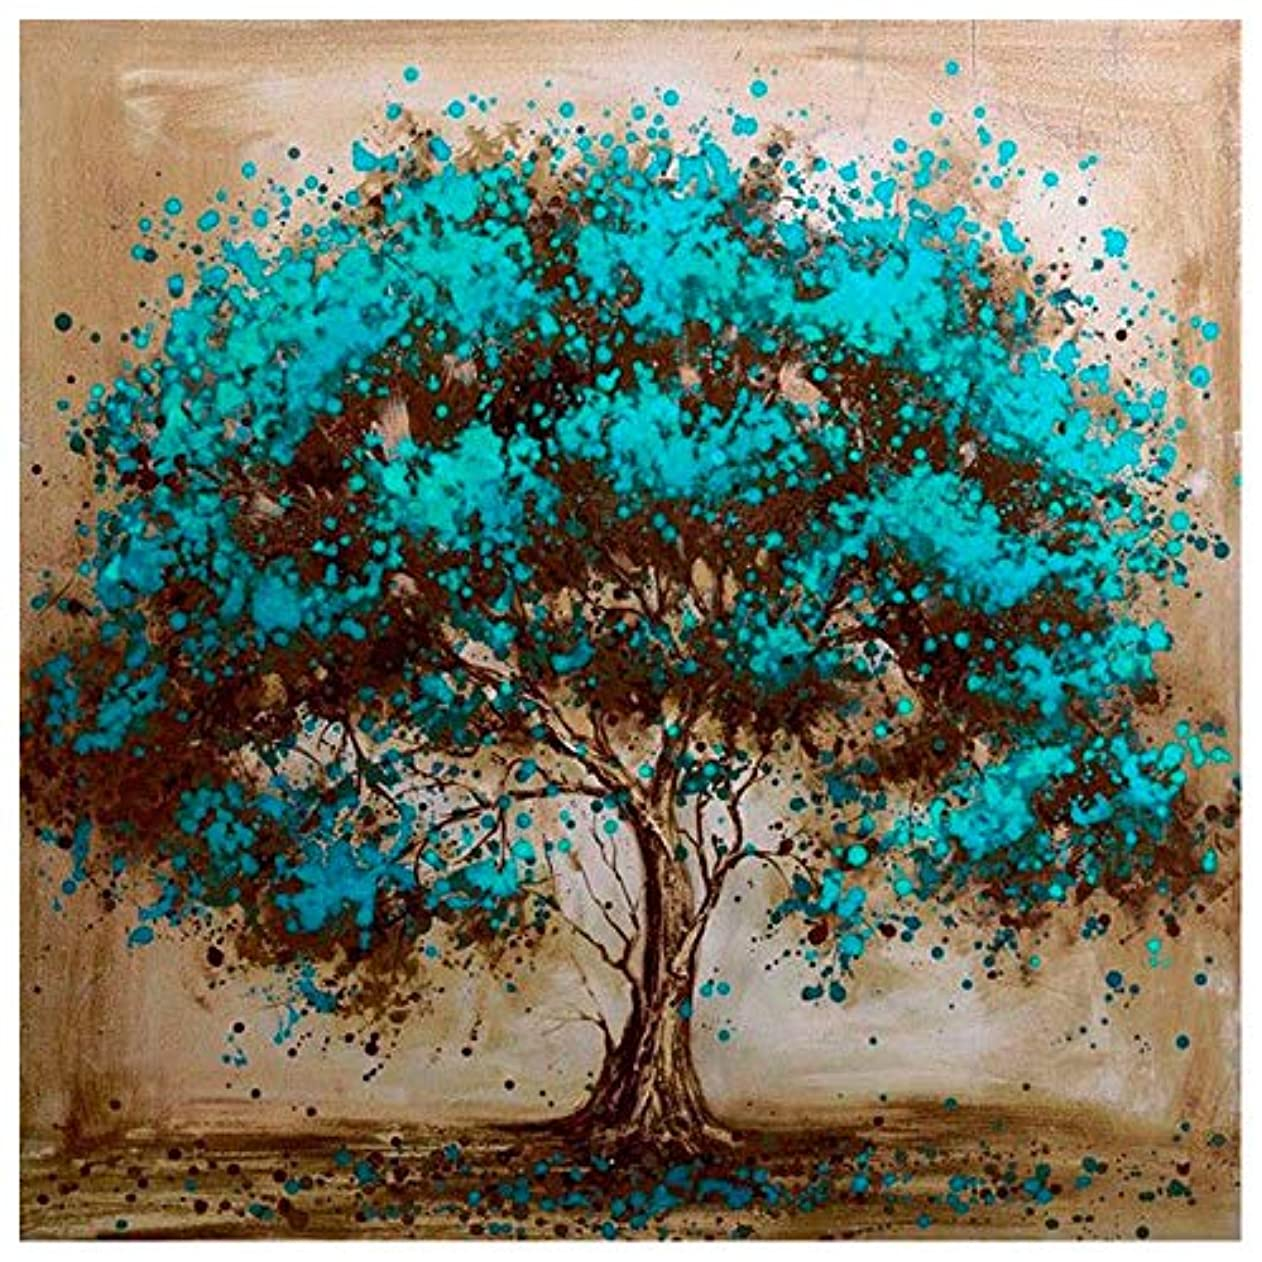 DIY 5D Painting with Diamonds Full Drill Diamond Dots Rhinestone Picture (Tree2) zkqgzuggsgk23570